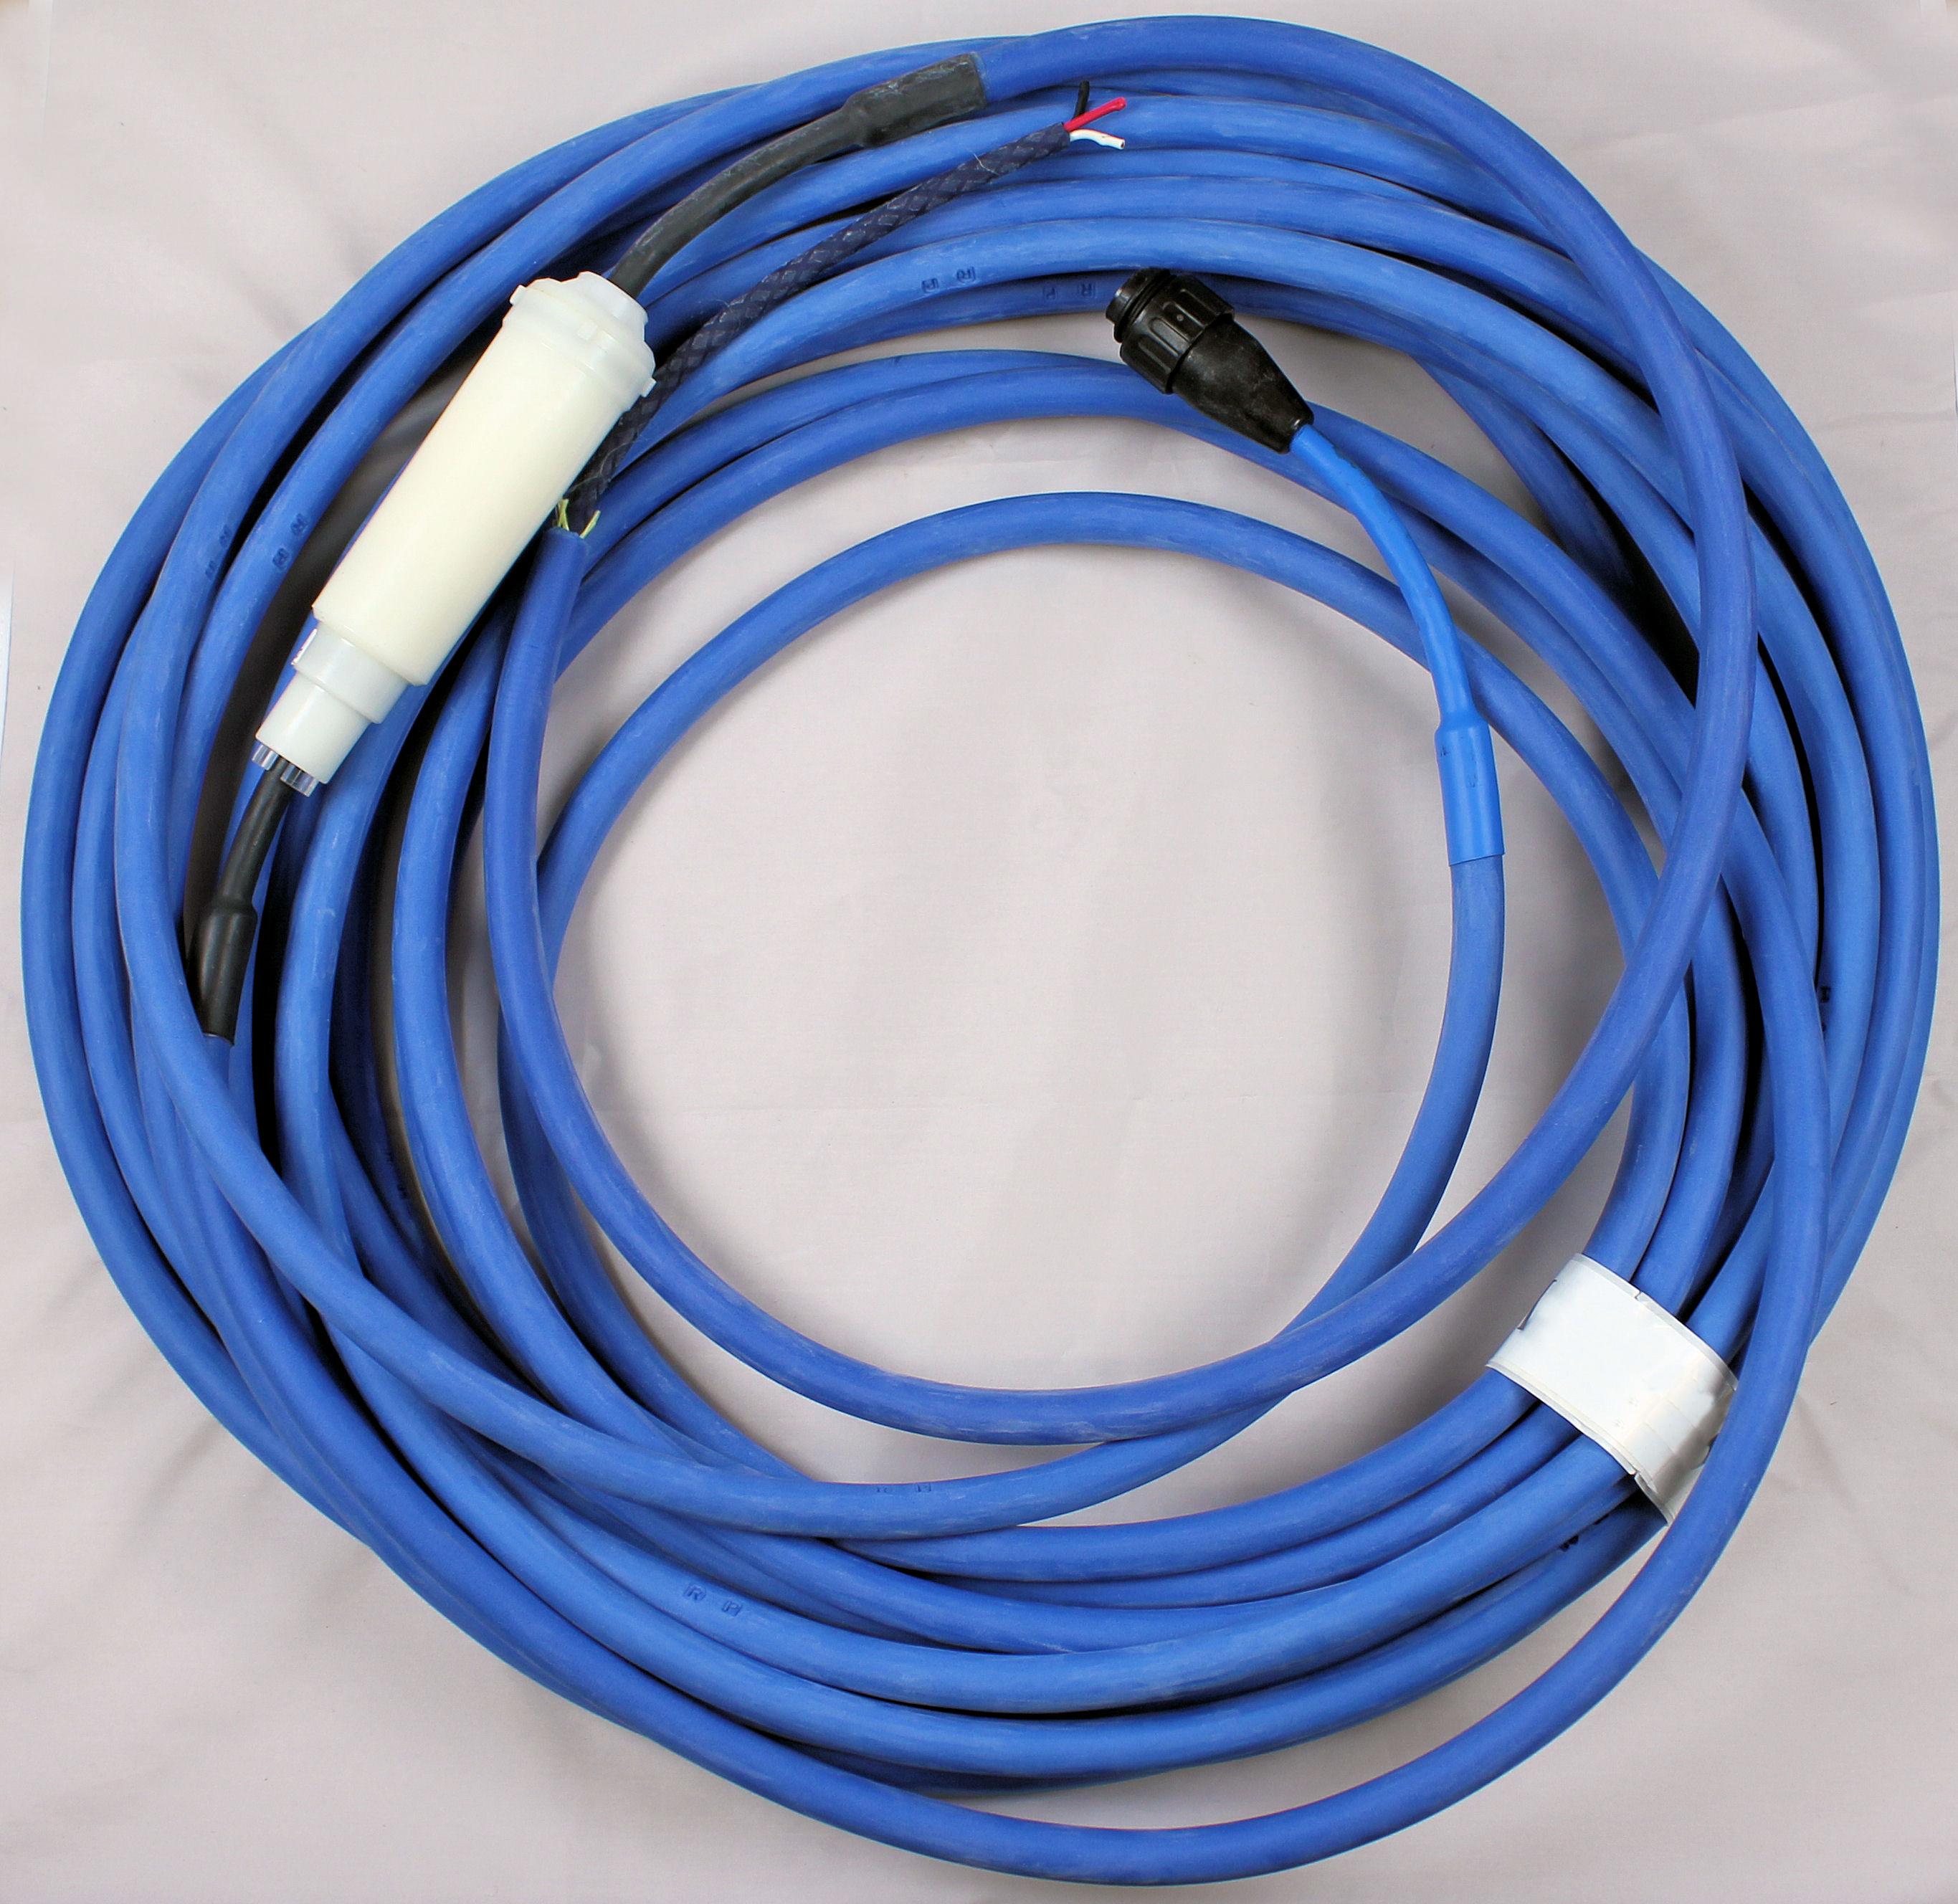 Maytronics Dolphin Dx6 Parts Aquaquality Pools Amp Spas Inc